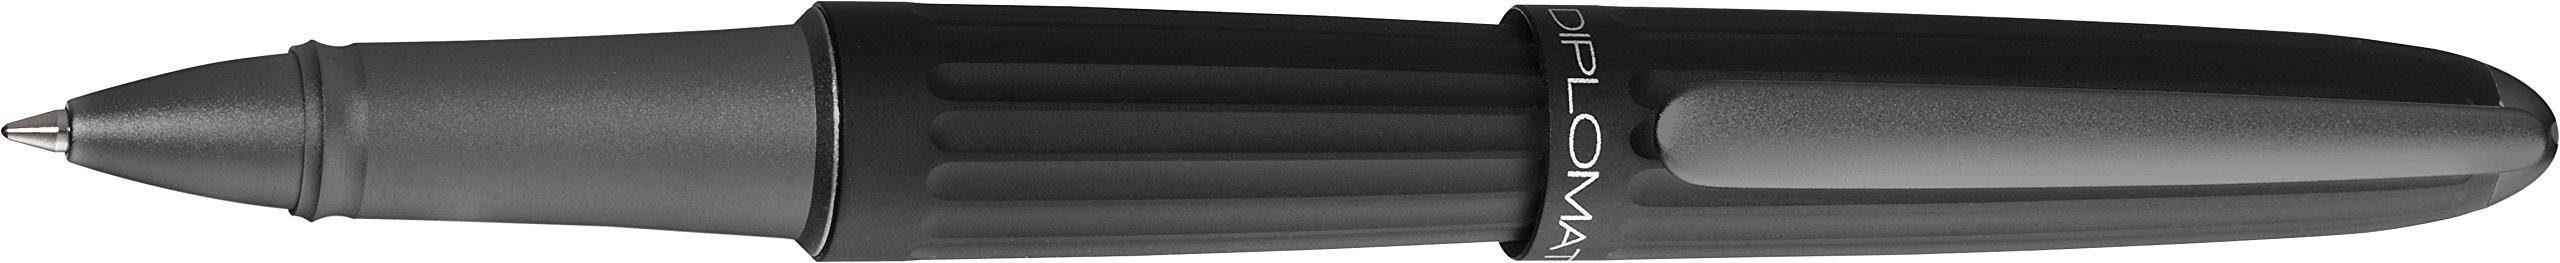 Diplomat AERO black, rollerball pen